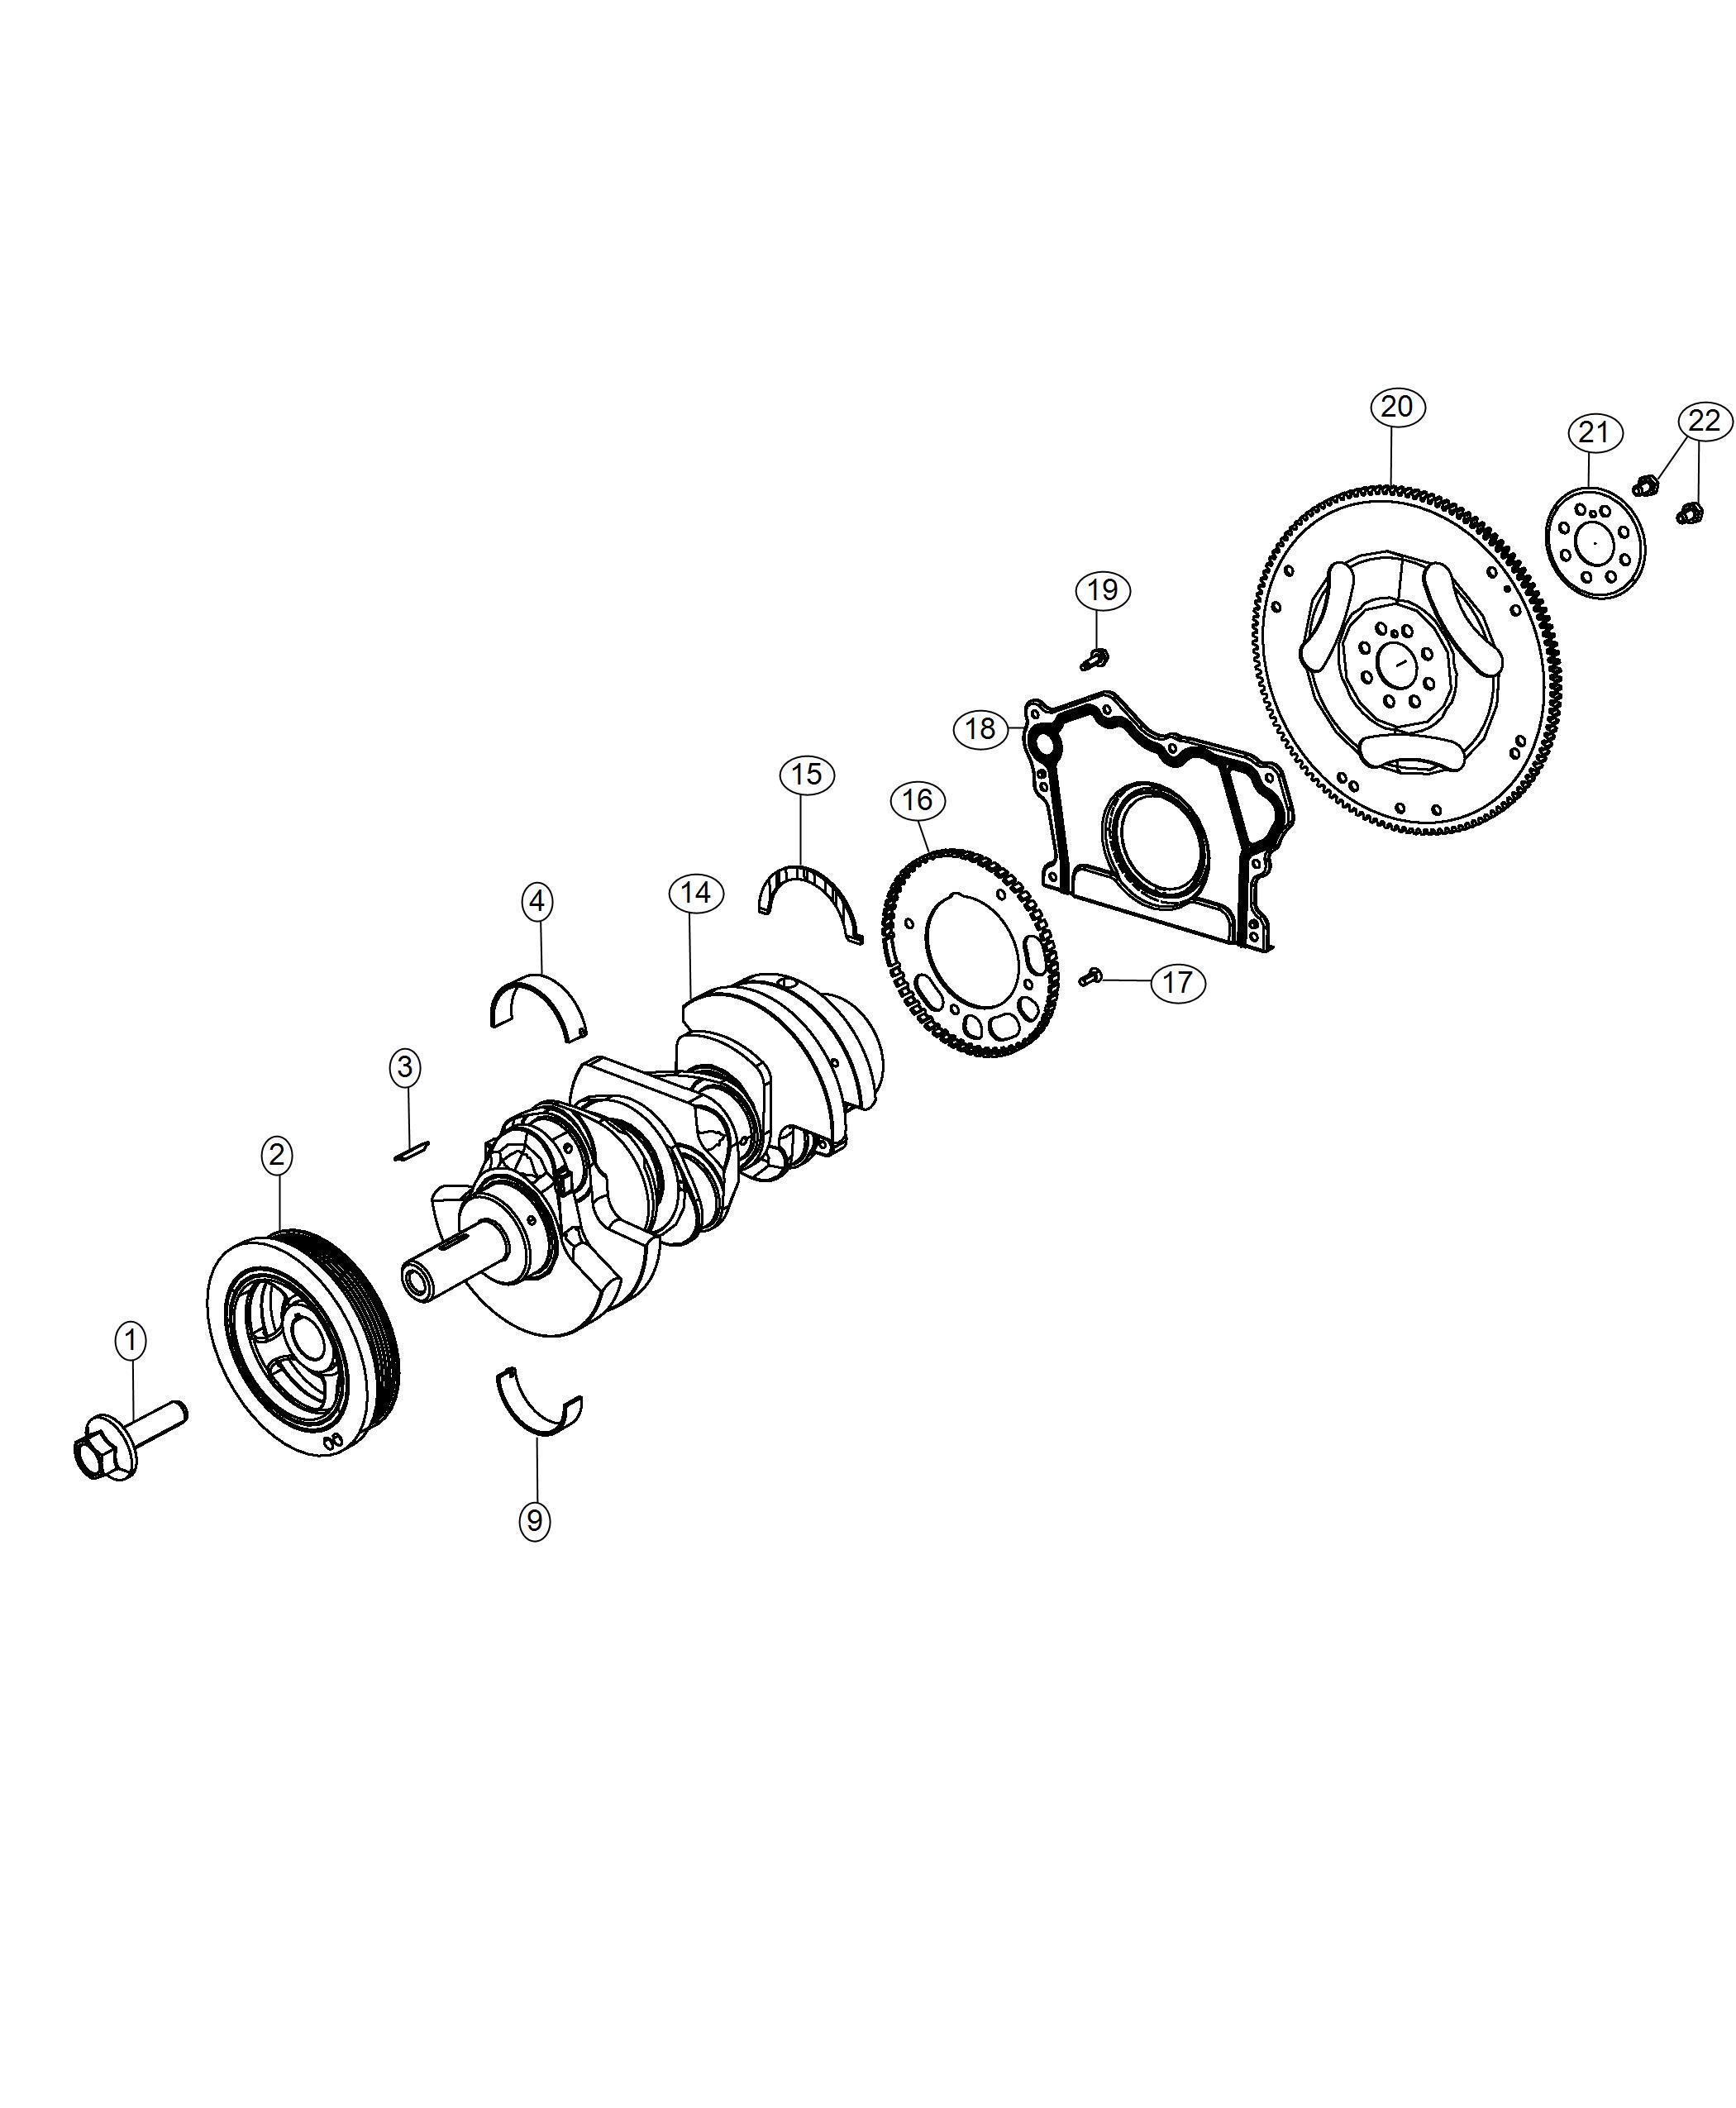 Chrysler 300 Crankshaft Bearings Damper Flywheel